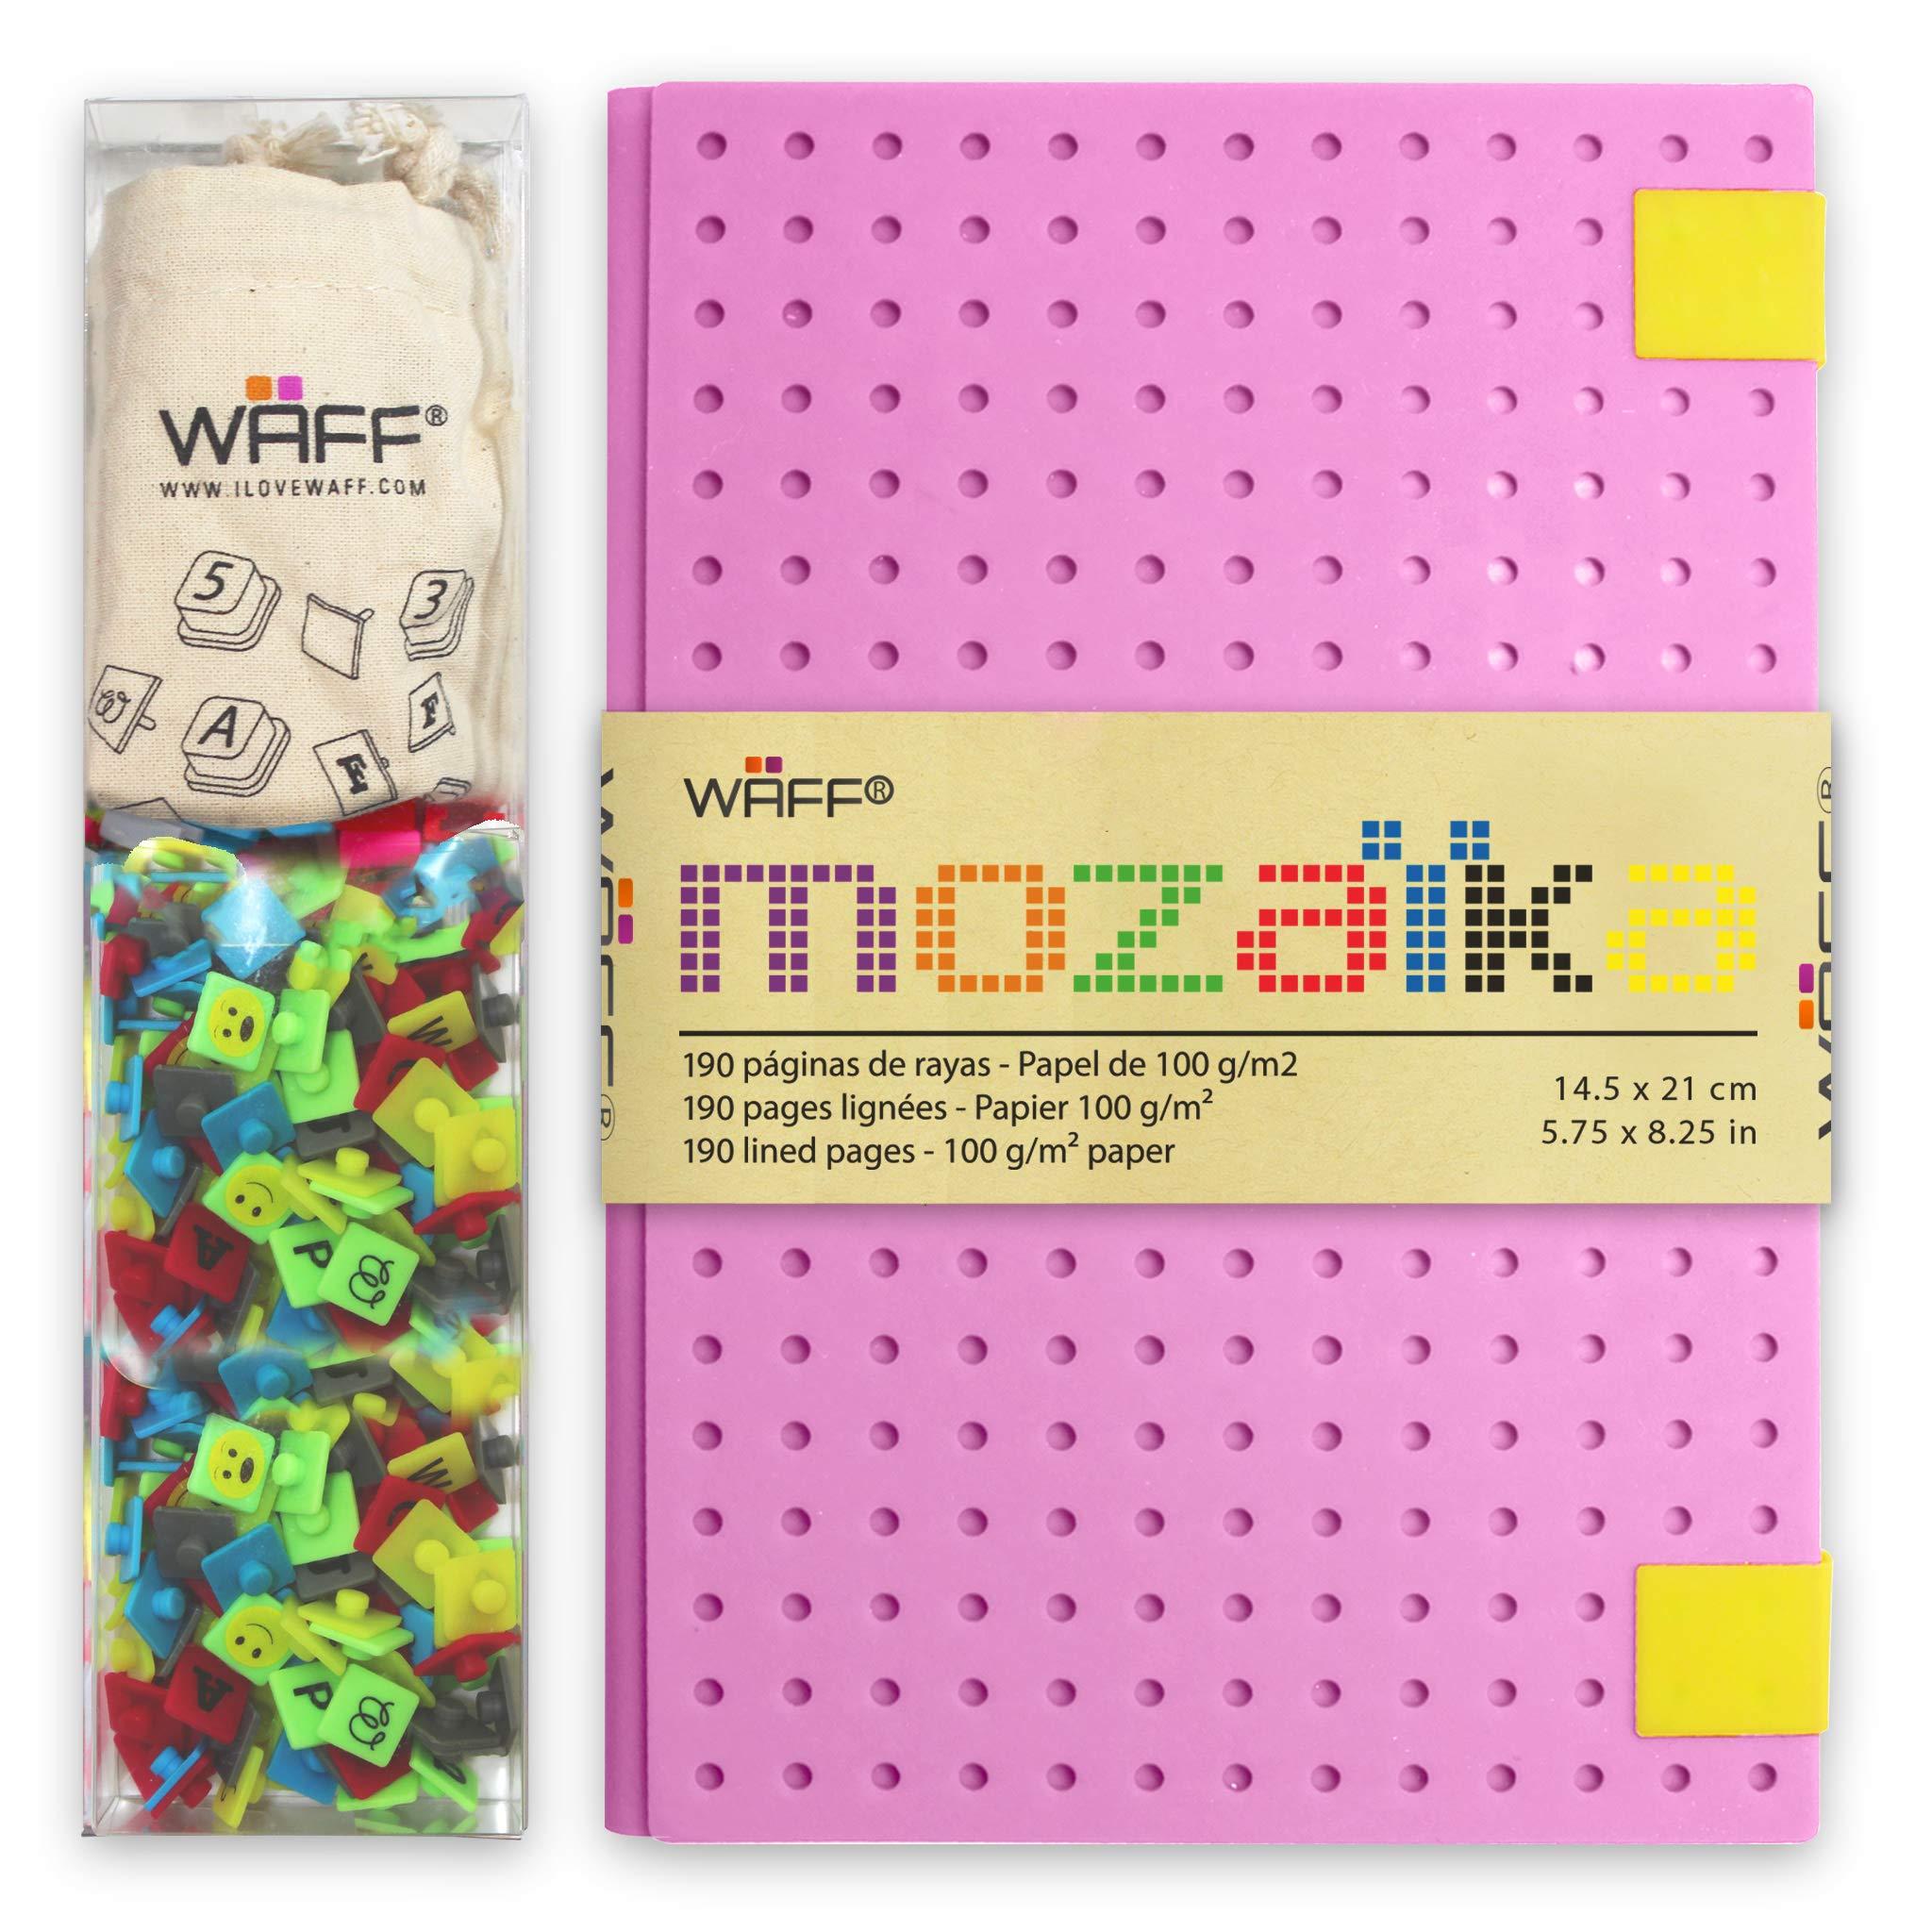 WAFF, Customizable Mozaika Notebook / Journal Combo, Large, 8.25'' x 5.5'', 240 Pegs + Bag - Lavender